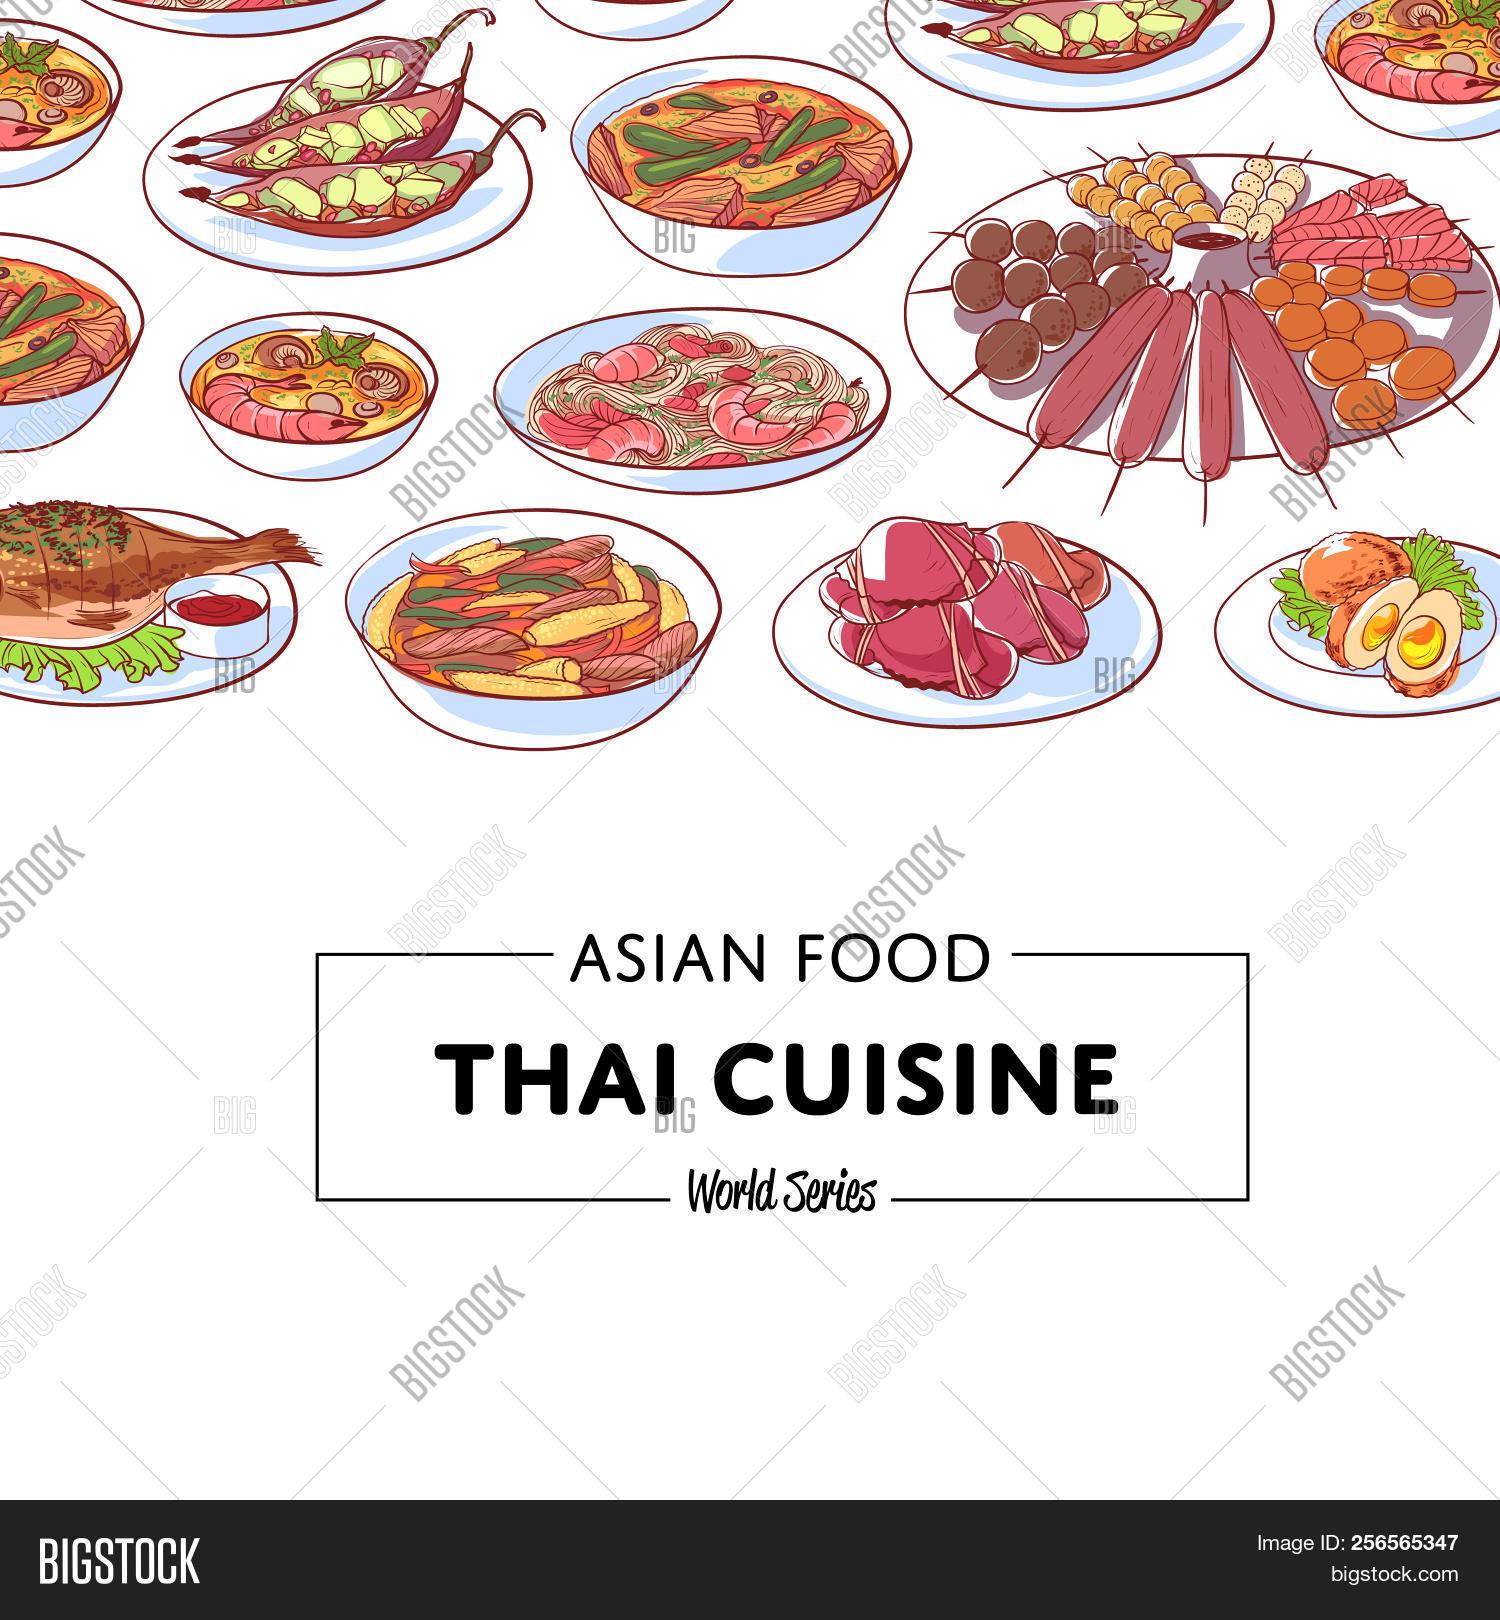 Thai Cuisine Poster Image Photo Free Trial Bigstock